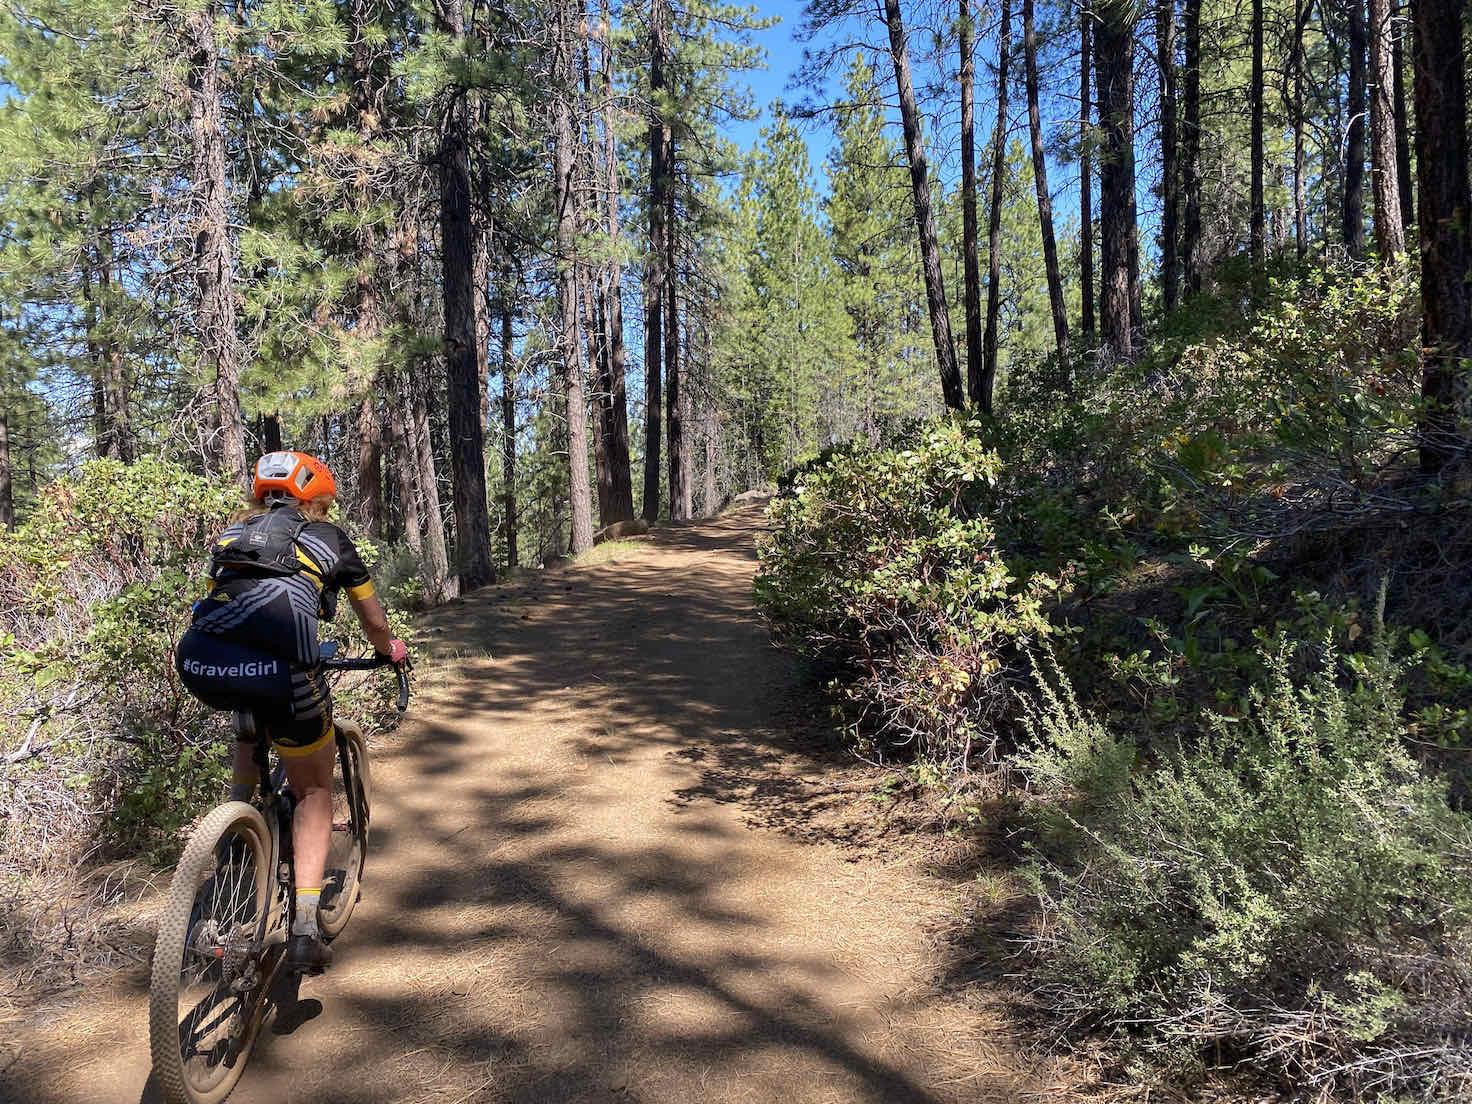 Gravel riding through the Ponderosa trees on Black Butte.